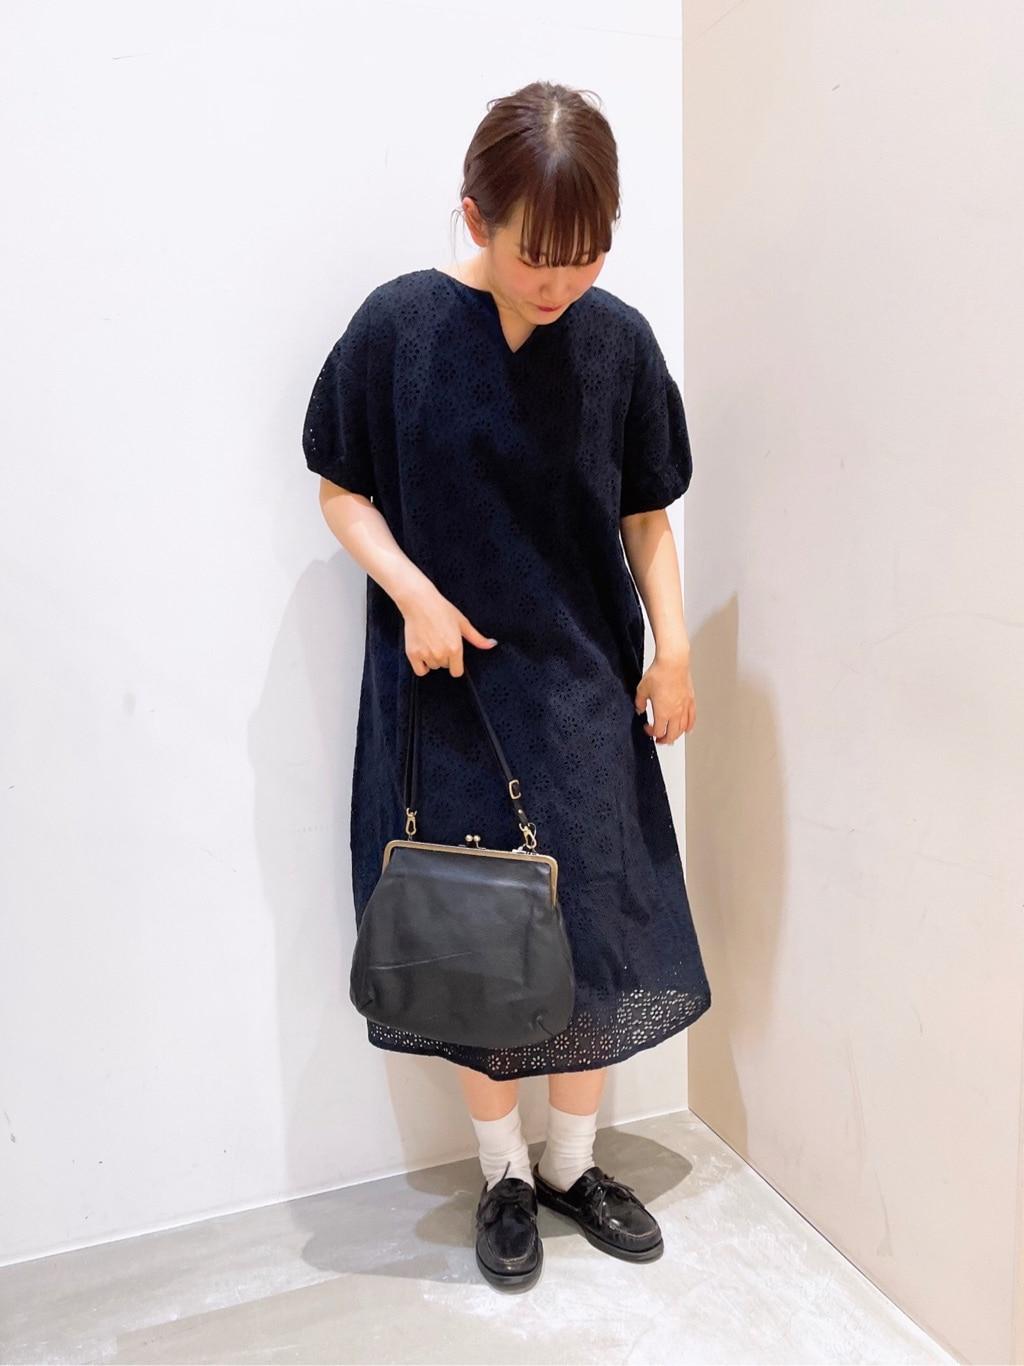 bulle de savon 阪急西宮ガーデンズ 身長:166cm 2021.04.19